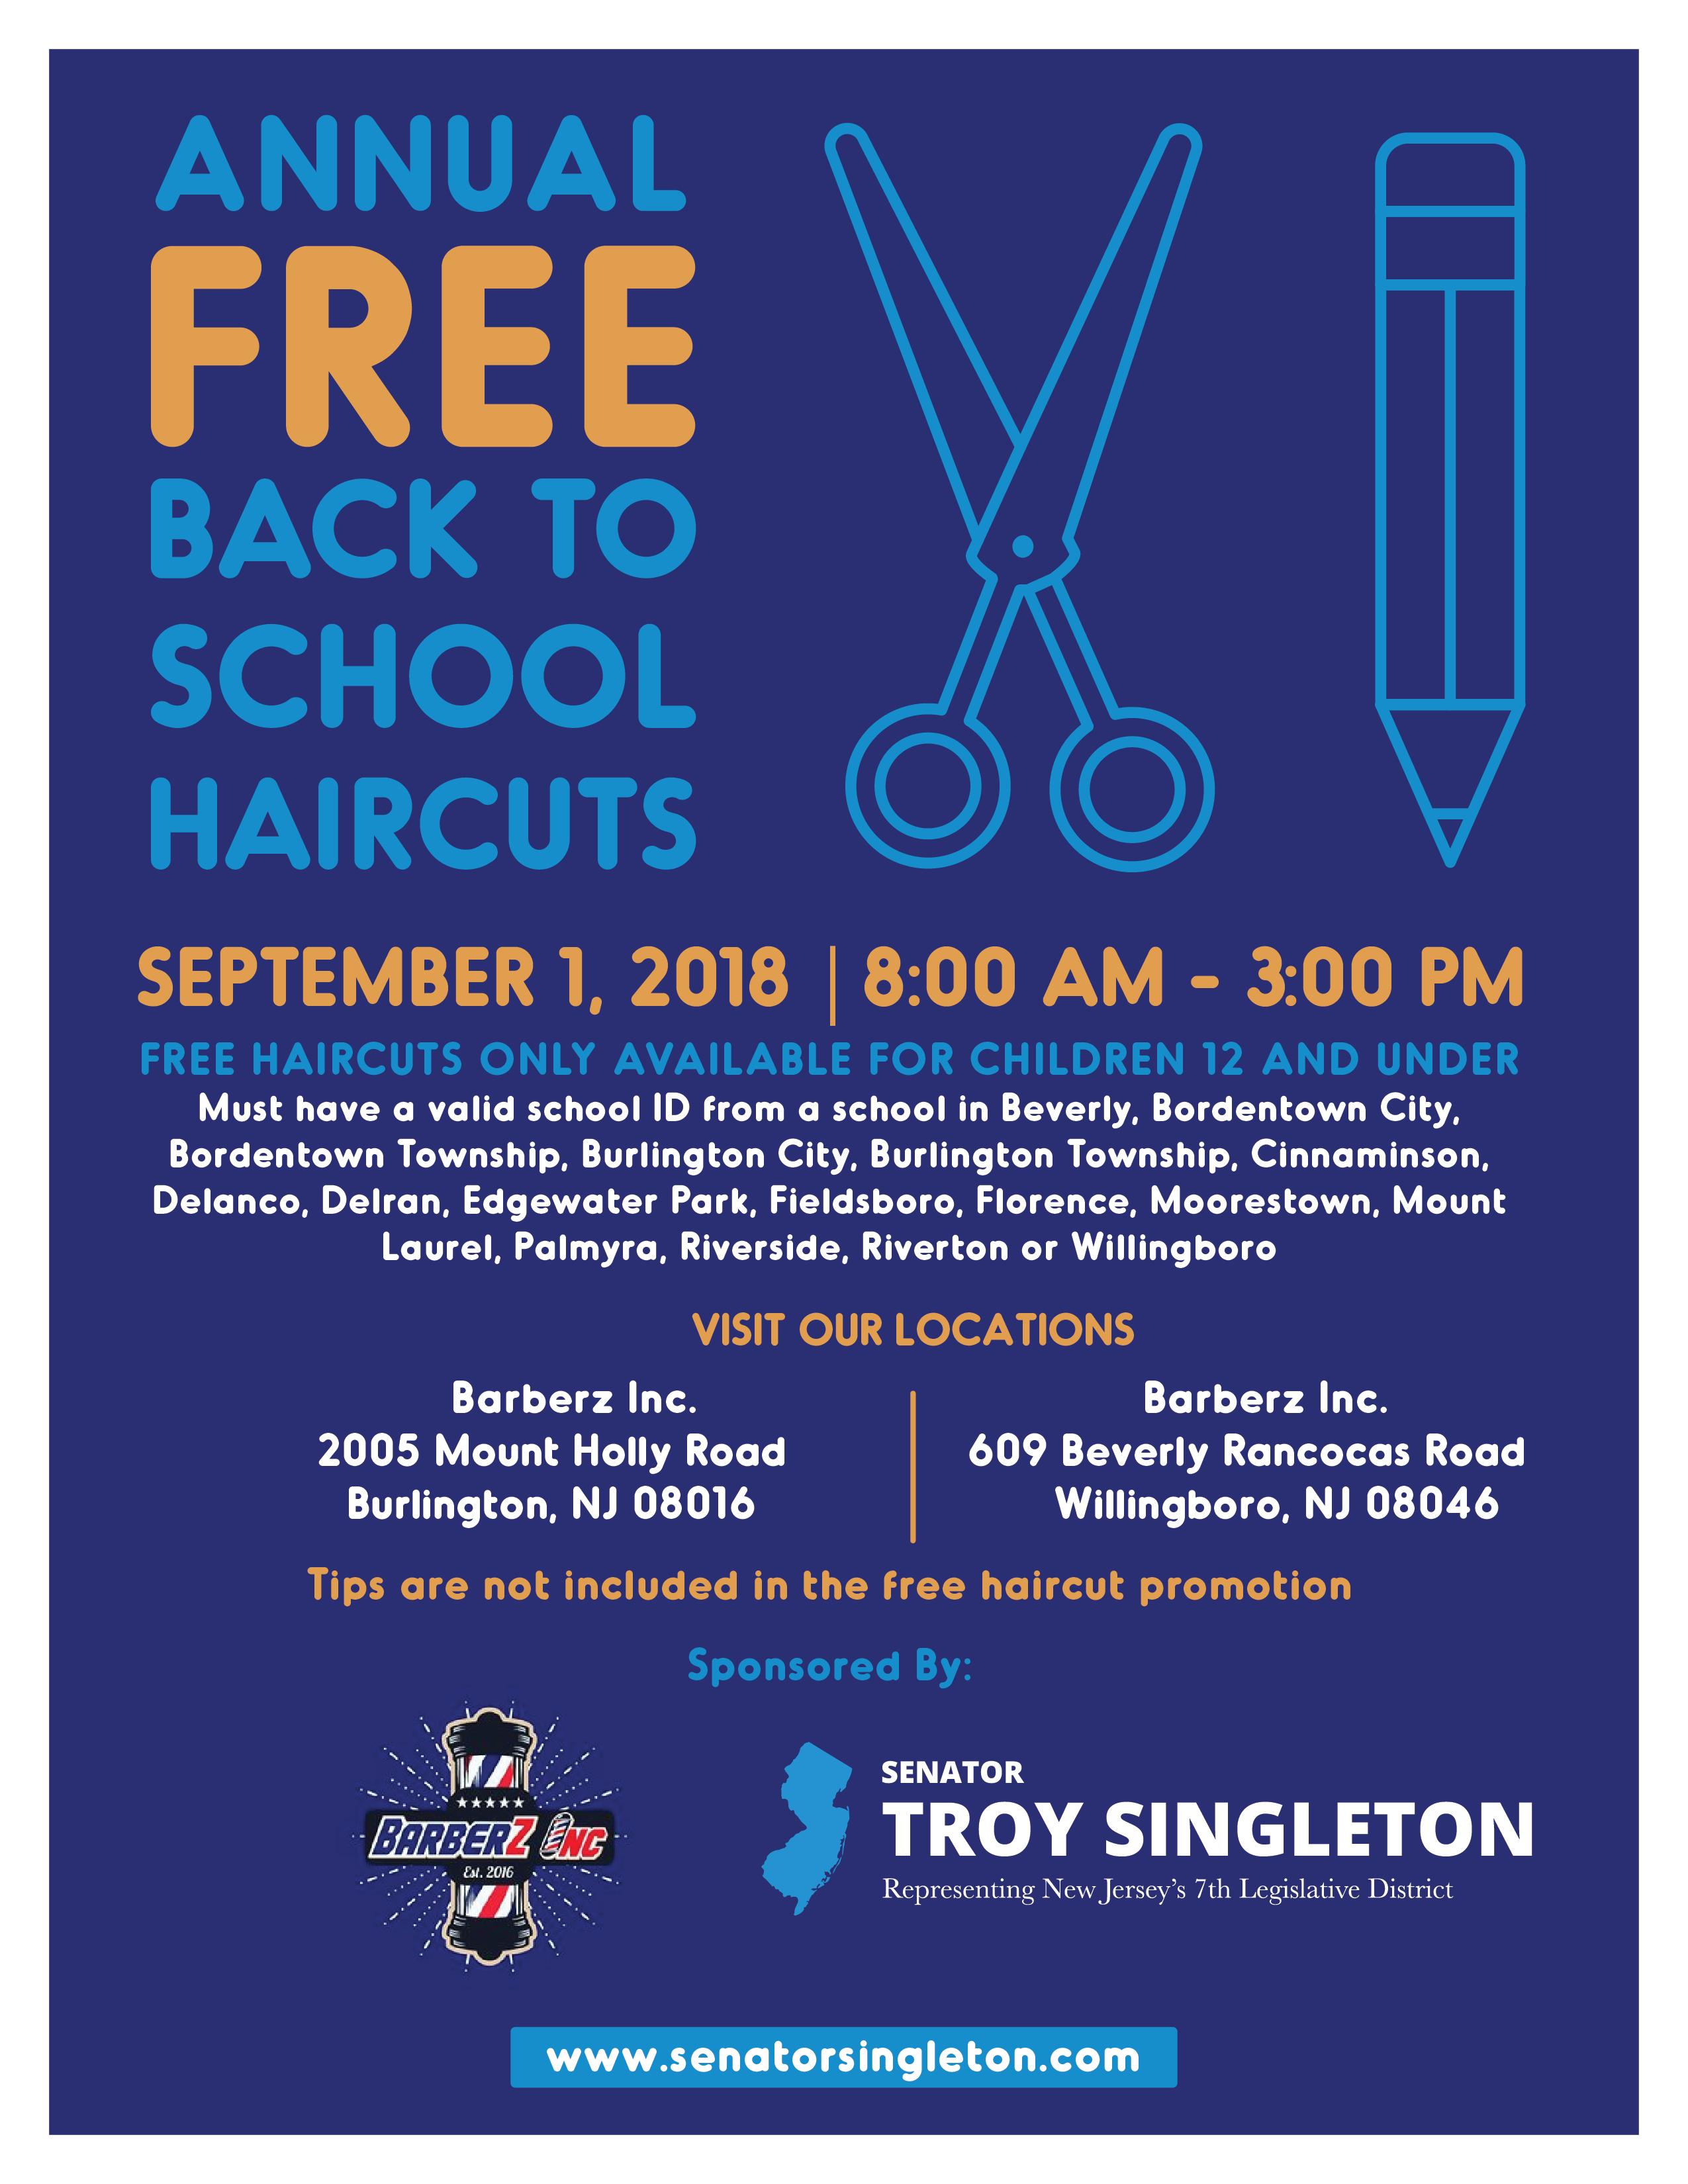 Singleton---Free-Hair-Cuts-Flyer-2018-v3.png